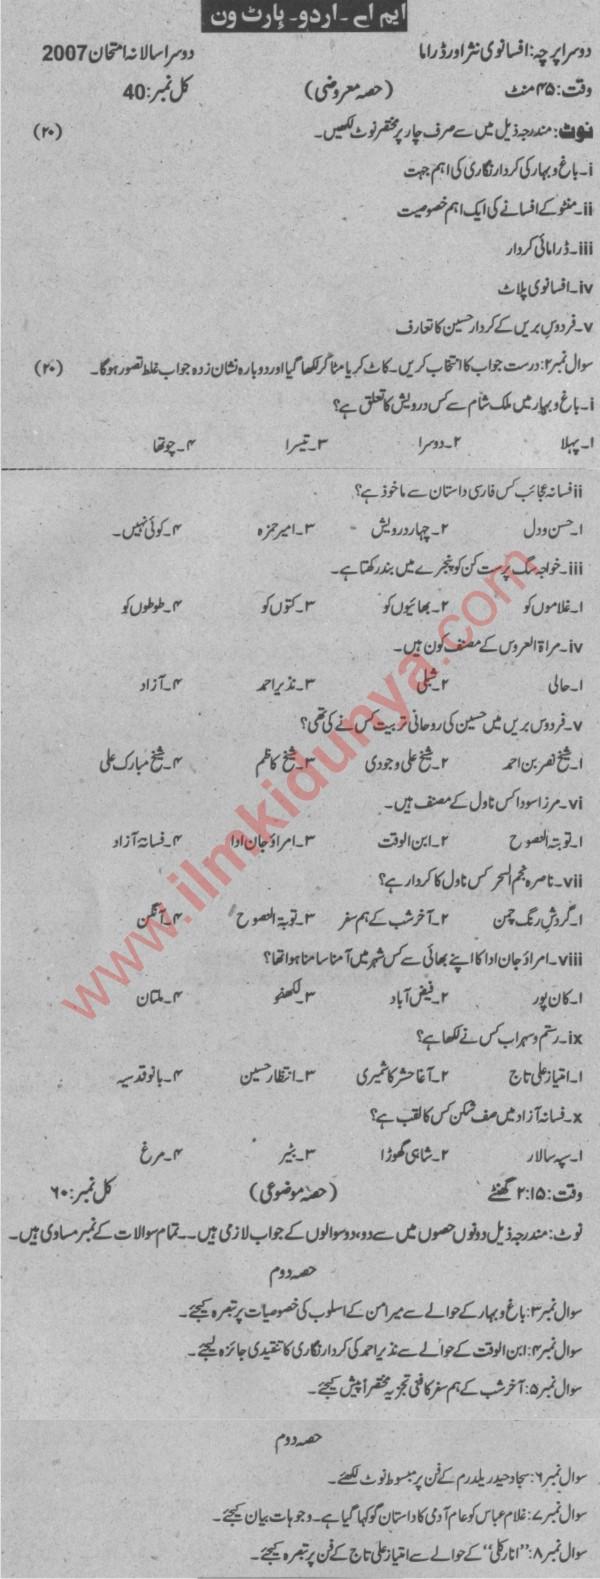 Sargodha University Past Papers 2007 MA Urdu Part 1